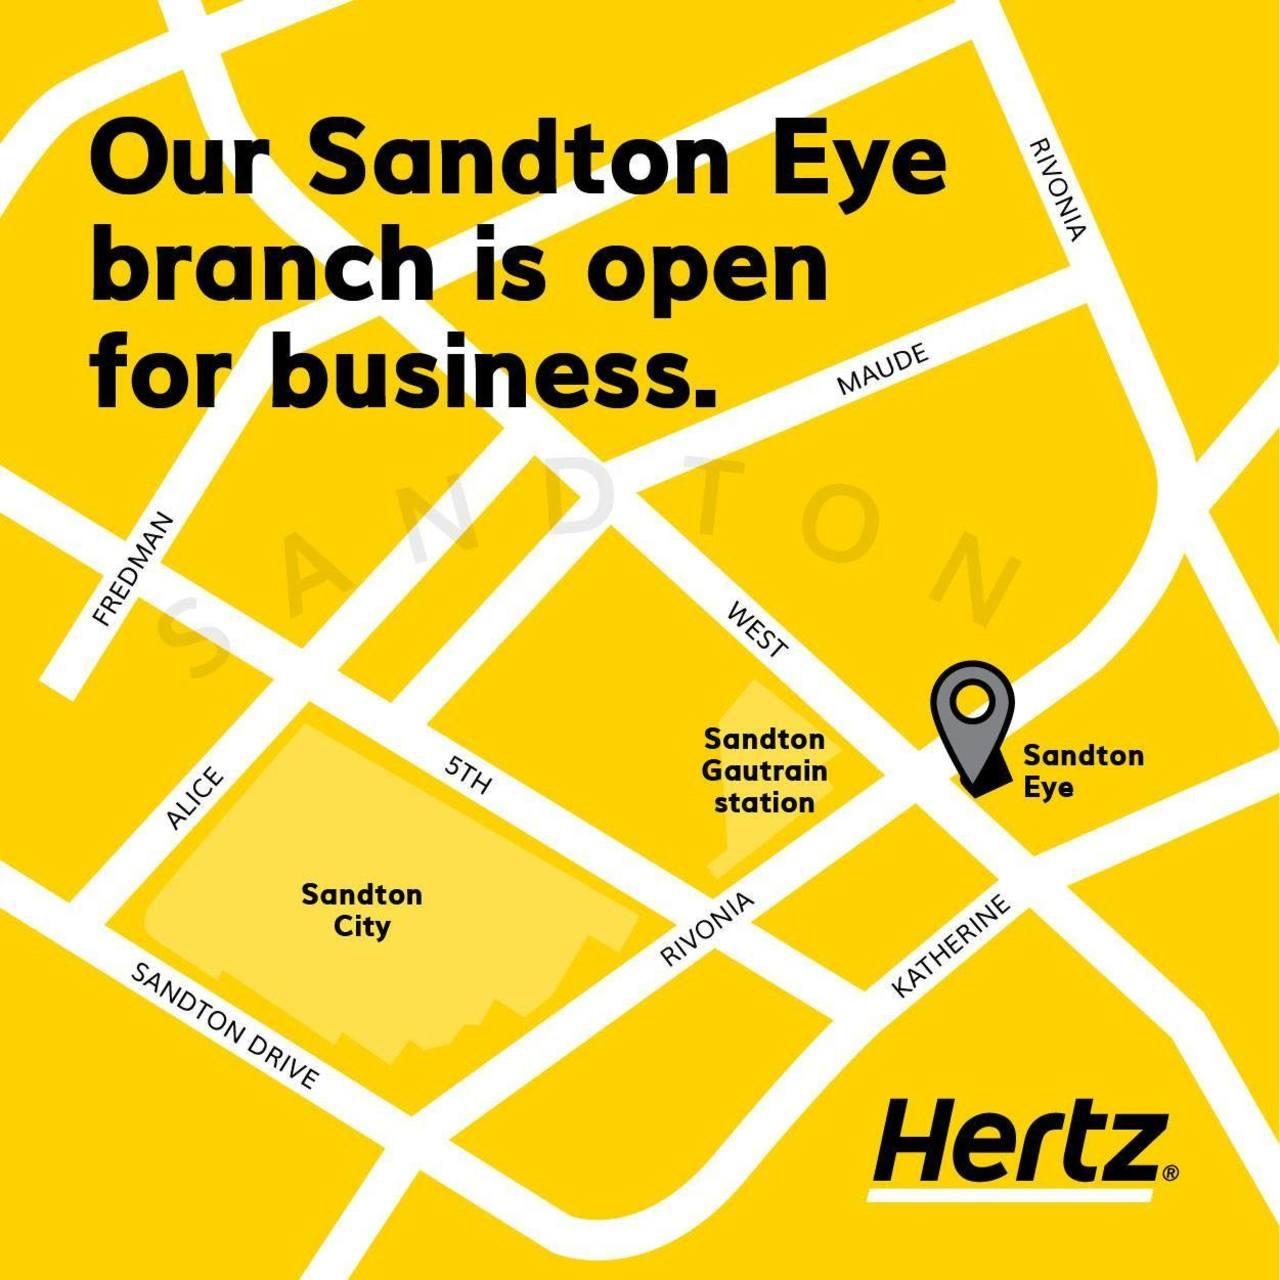 sandton eye